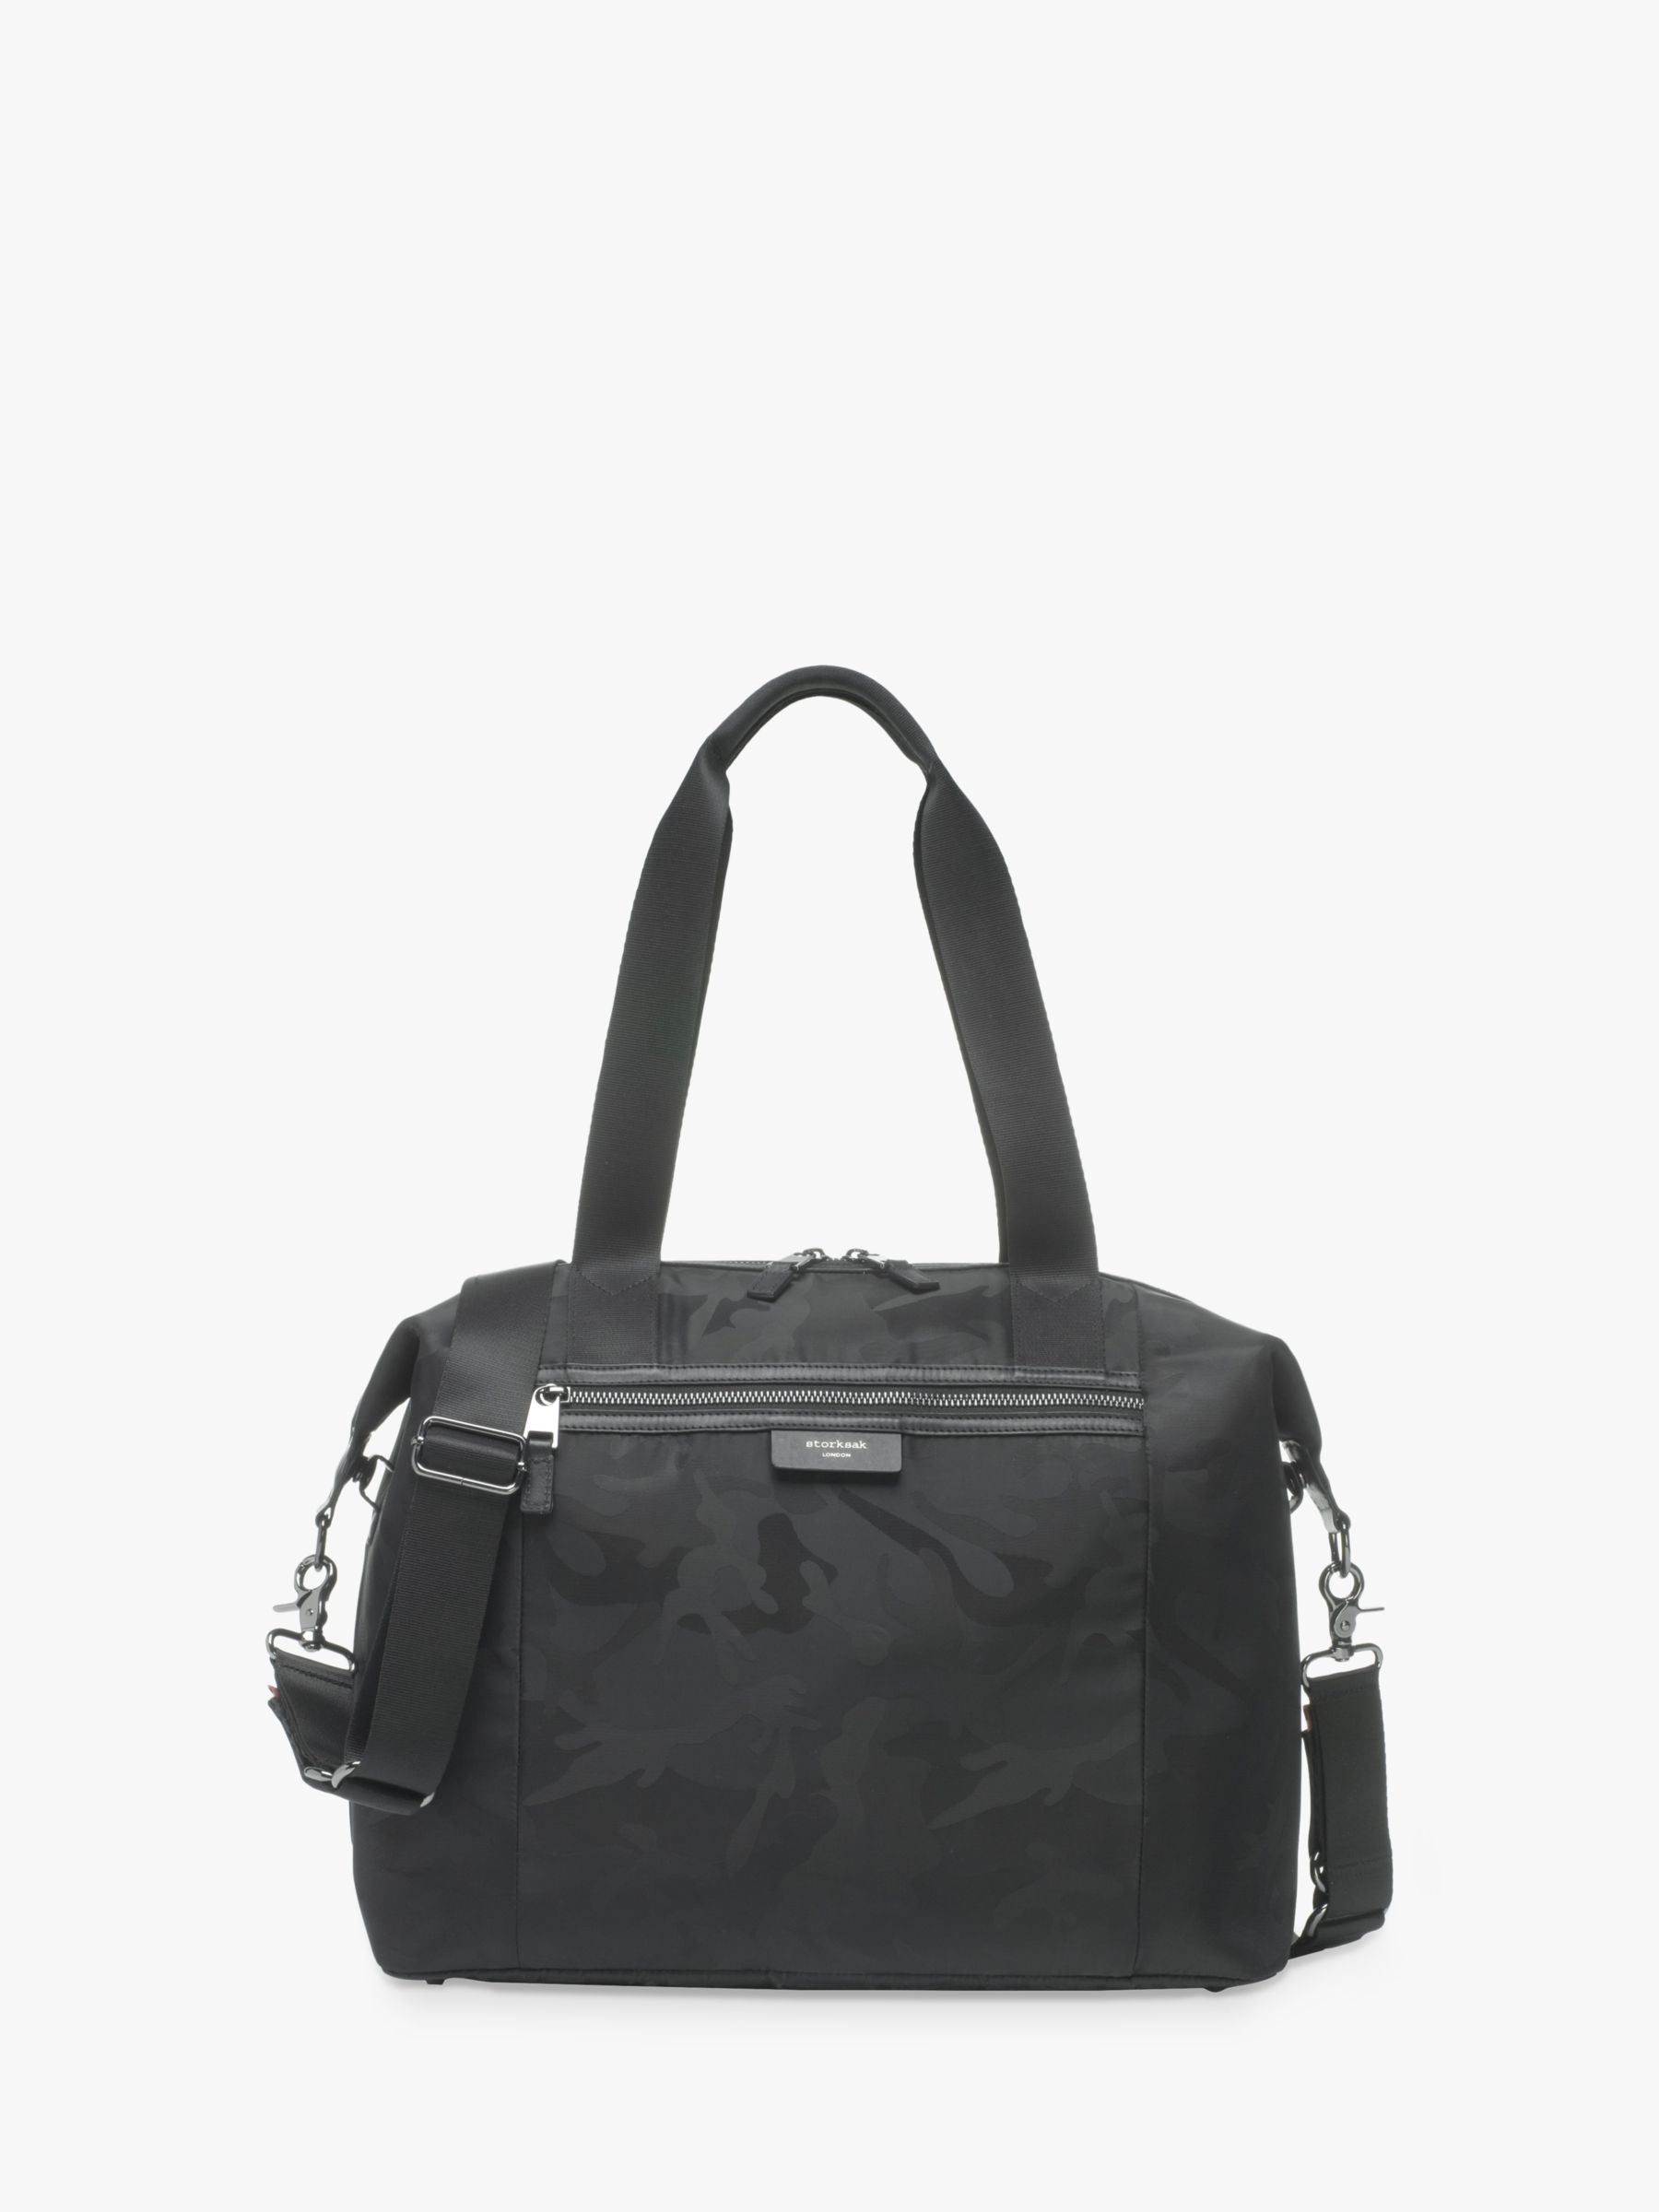 Storksak Storksak Stevie Luxe Changing Bag, Black Camo